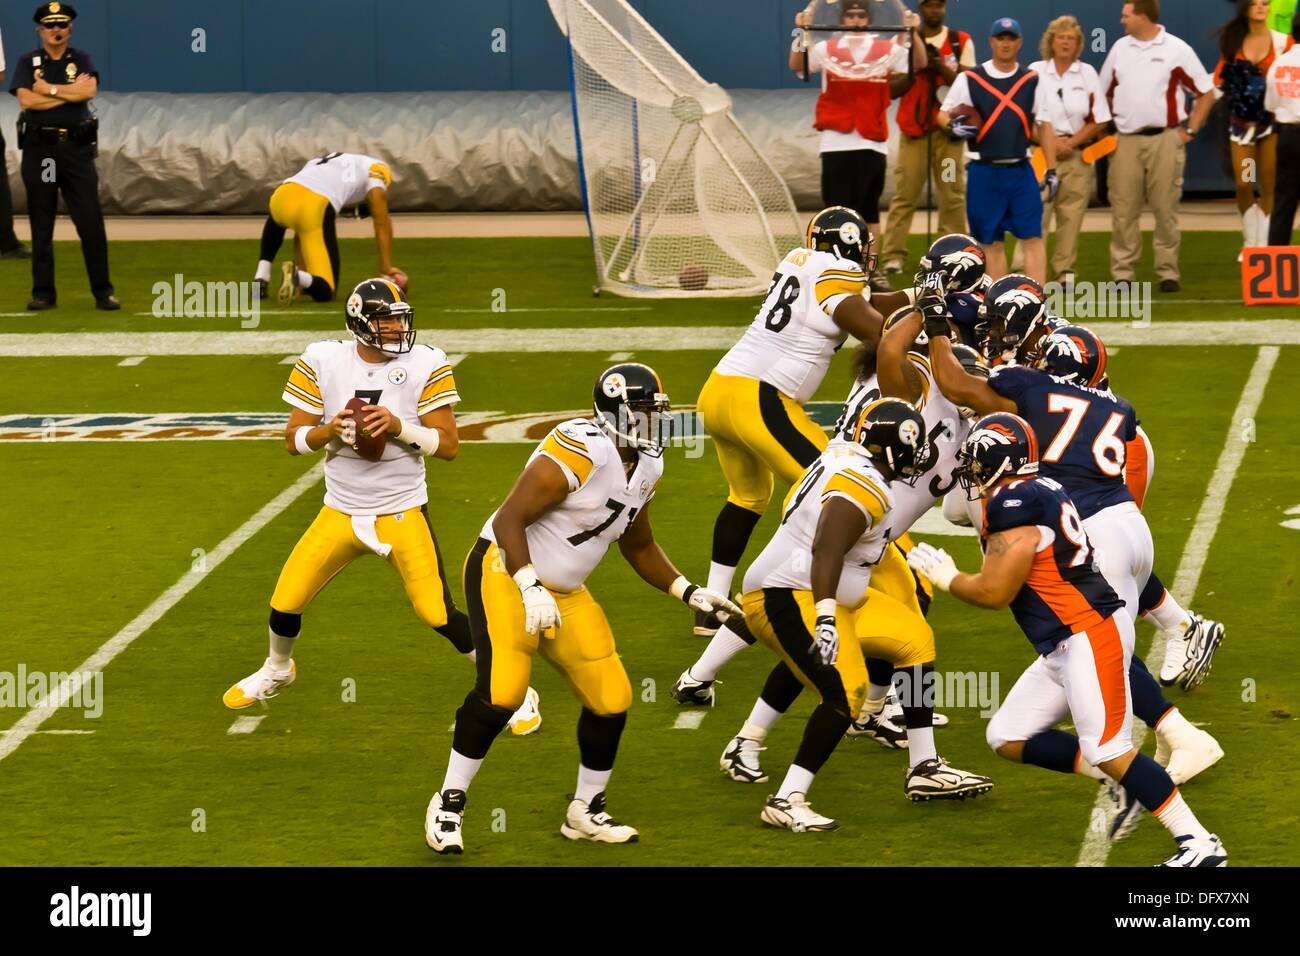 075b4e948 Quarterback Ben Roethlisberger (Steelers) dropping back to pass ...